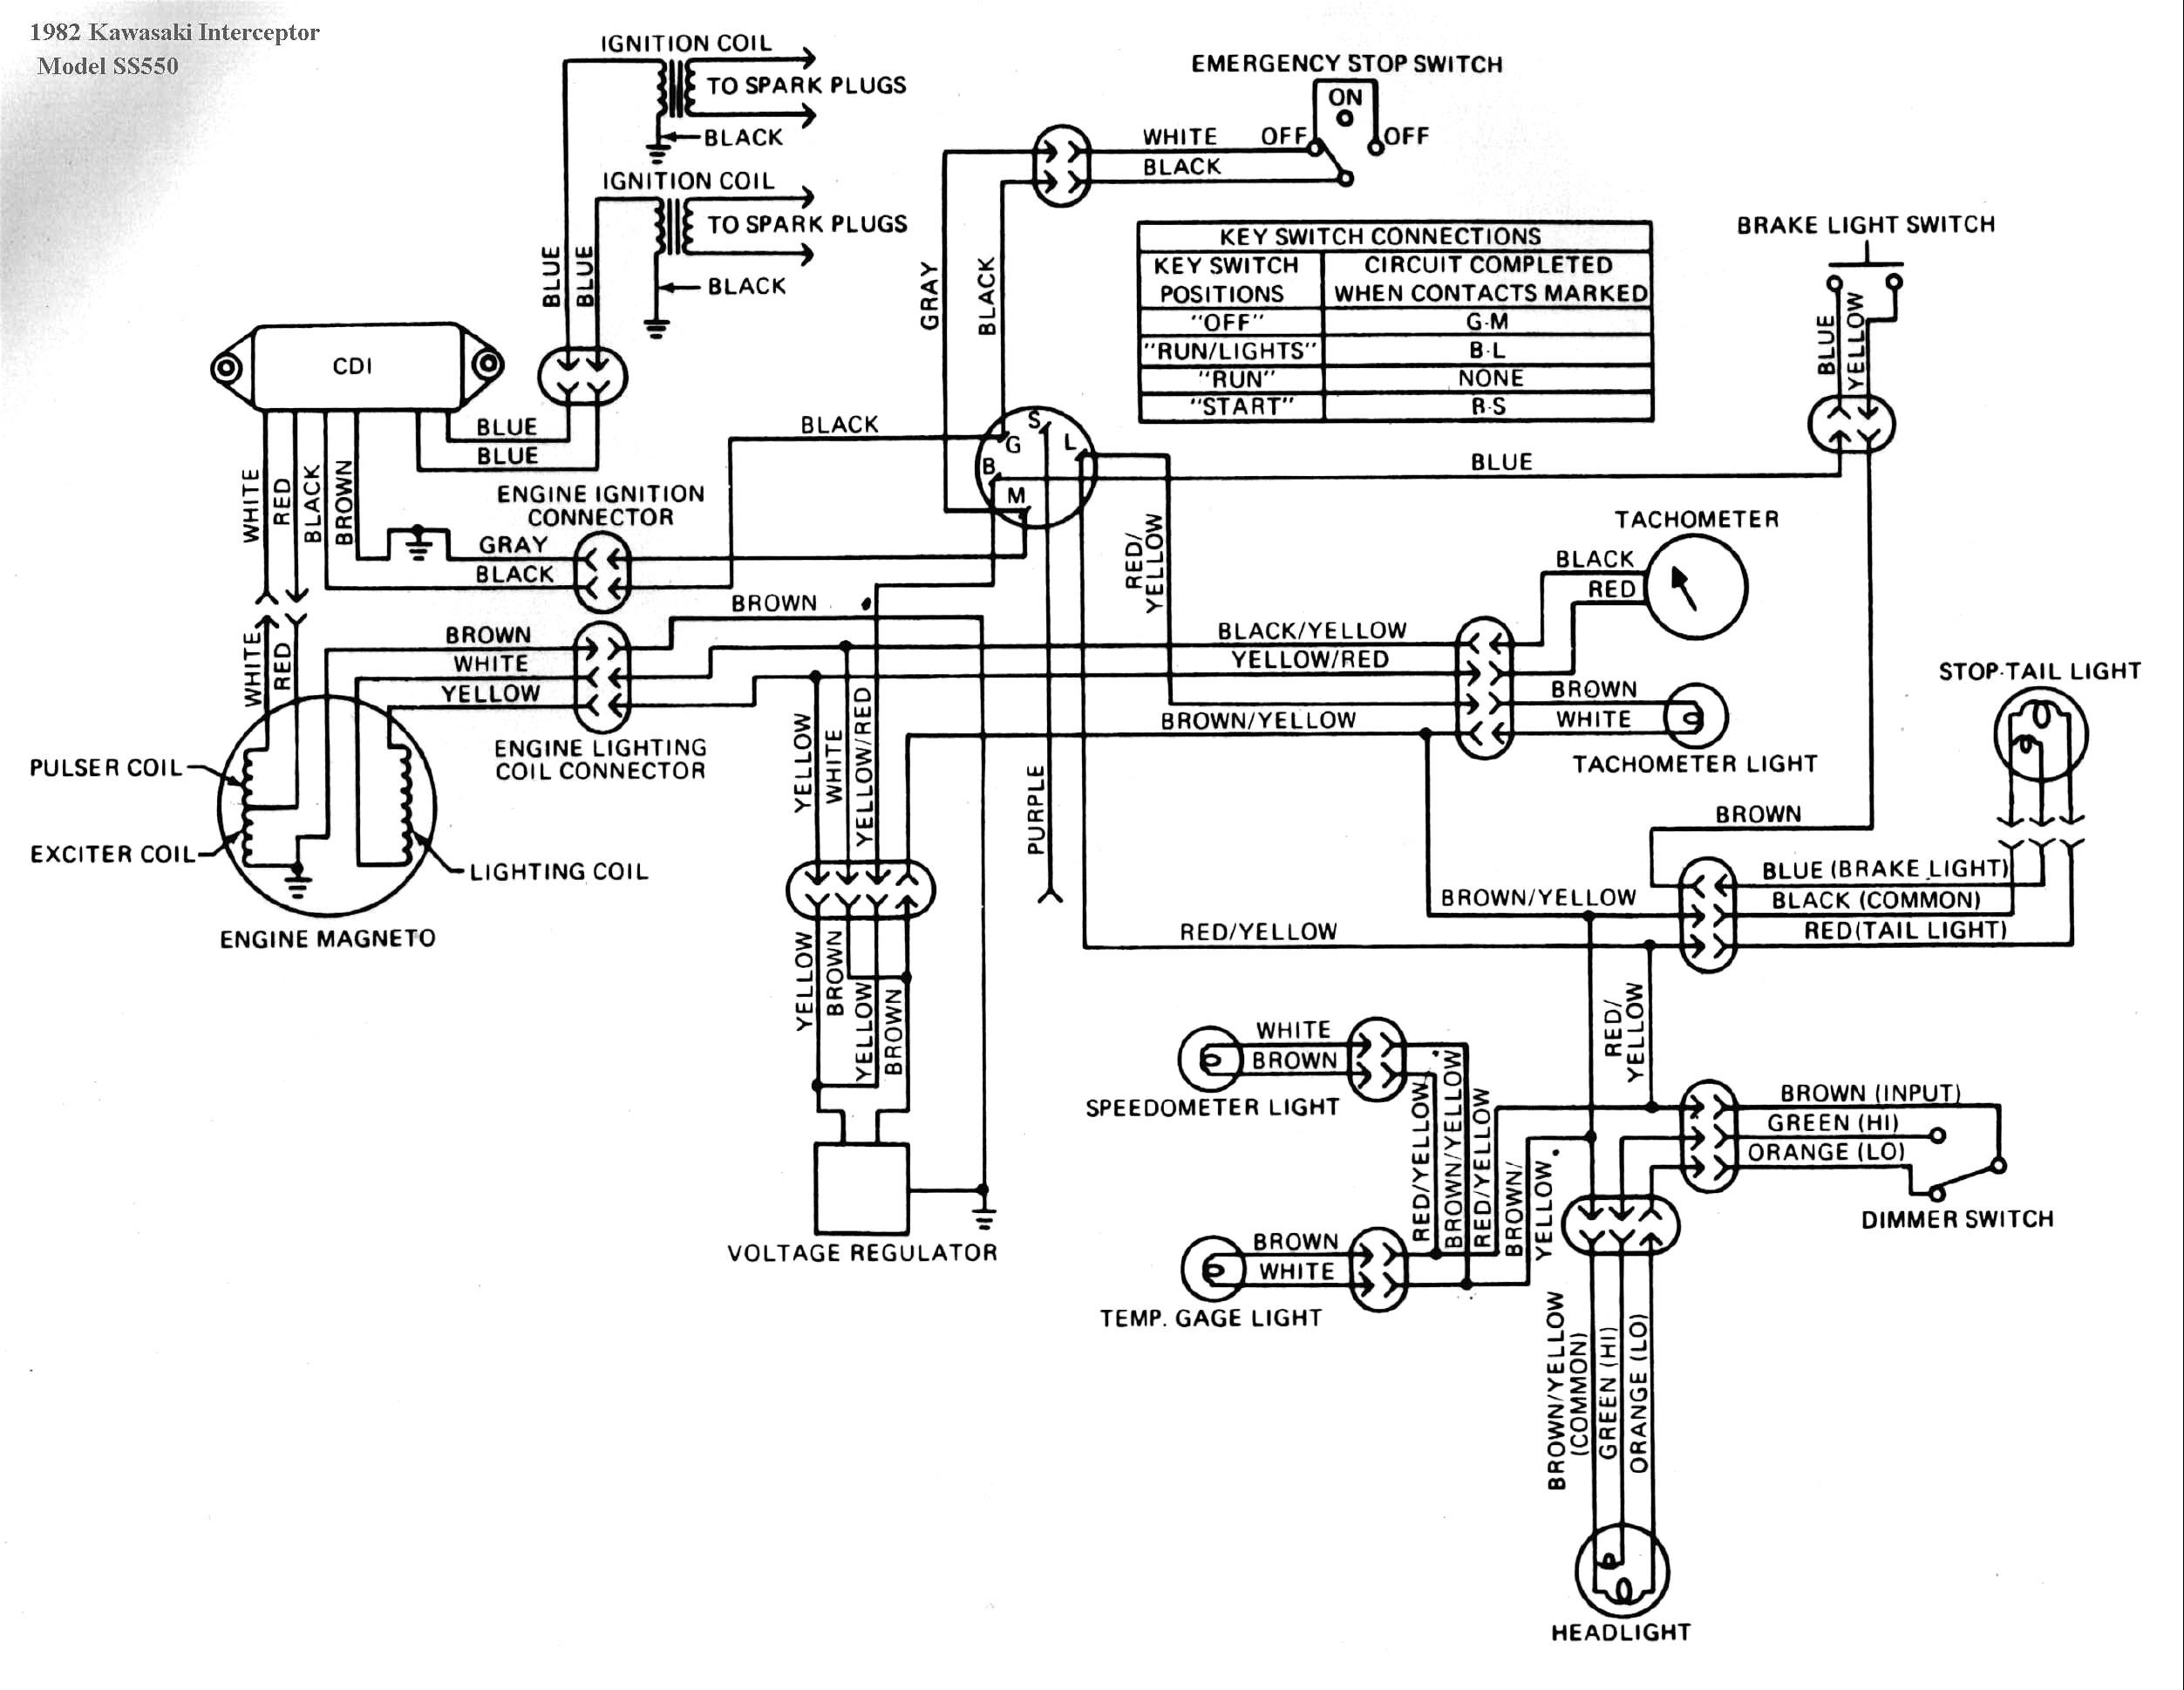 Kawasaki Mule Wiring Diagram Wiring Diagram On Kawasaki Jet Ski All Kind Of Wiring Diagrams U Rh Wiringdiagramweb Today Kawasaki Mule Wiring Diagram Kawasaki Mule F on 2000 Lincoln Ls Fuel System Diagram